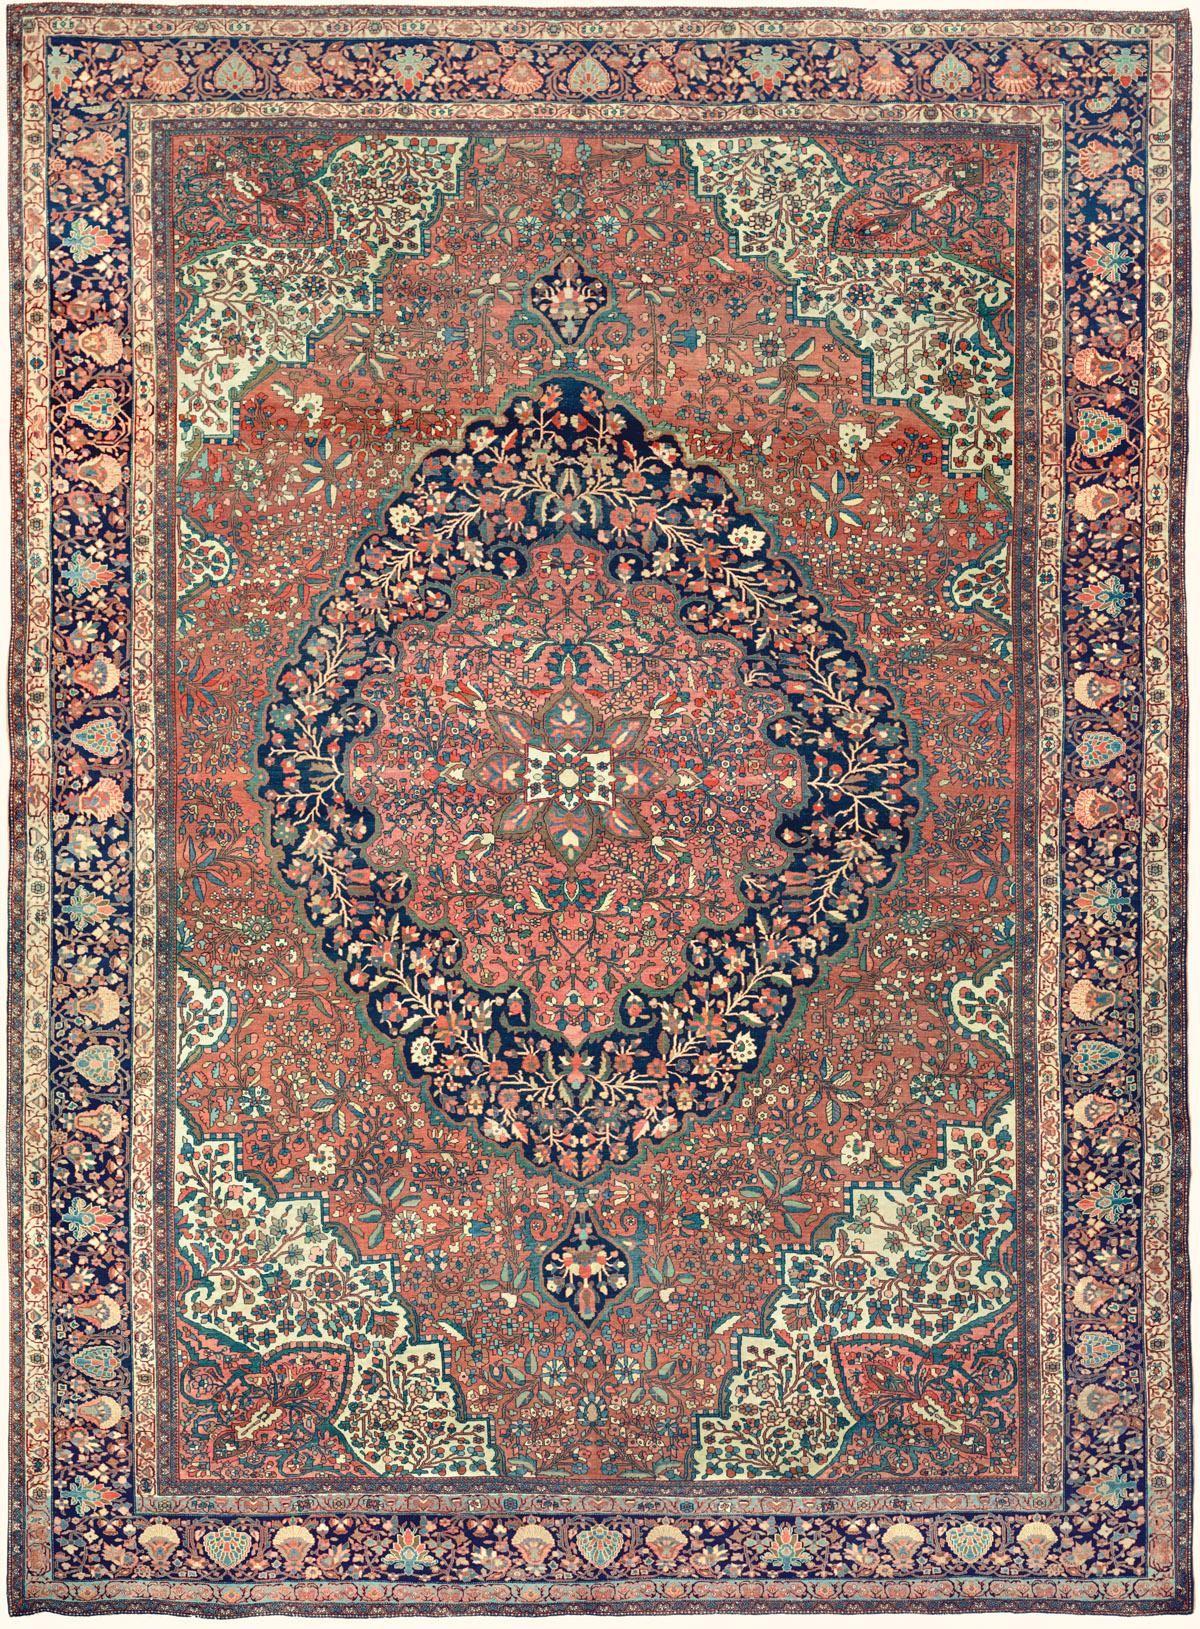 19th Century Ferahan Sarouk Oriental Room Size Carpet